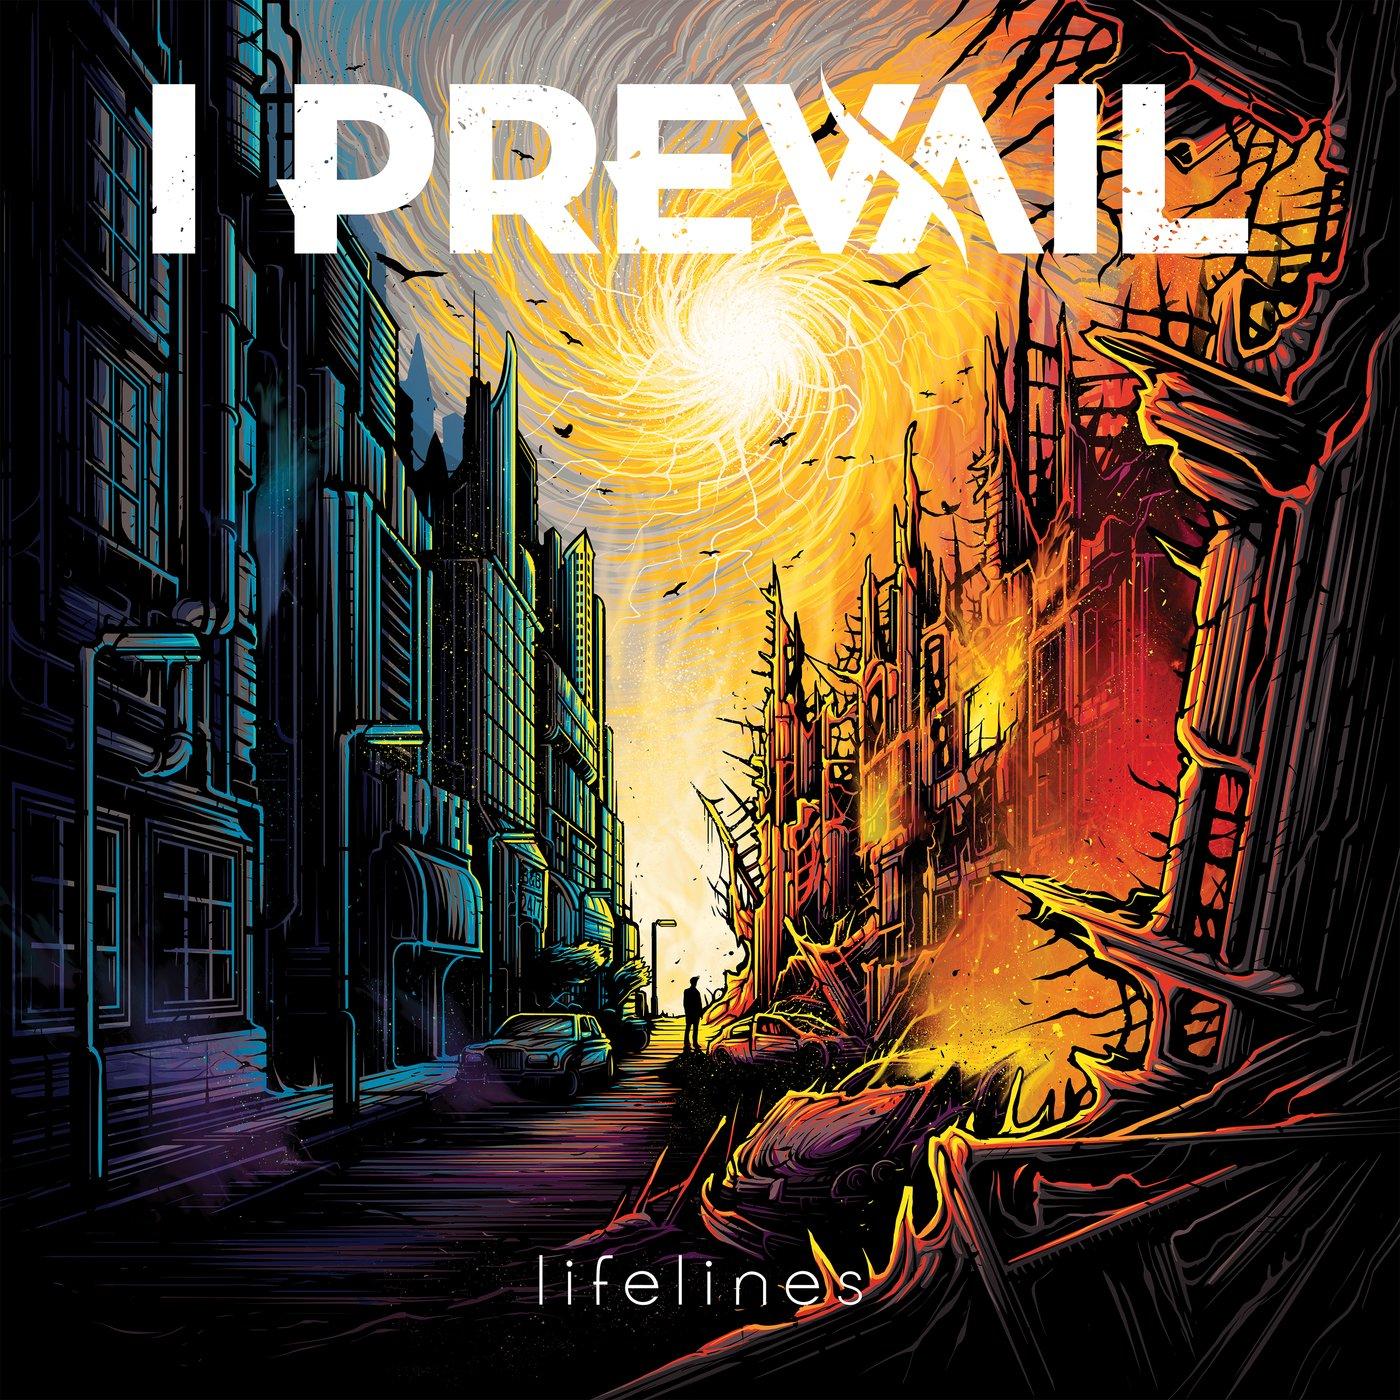 CD : I Prevail - Lifelines [Explicit Content] (CD)